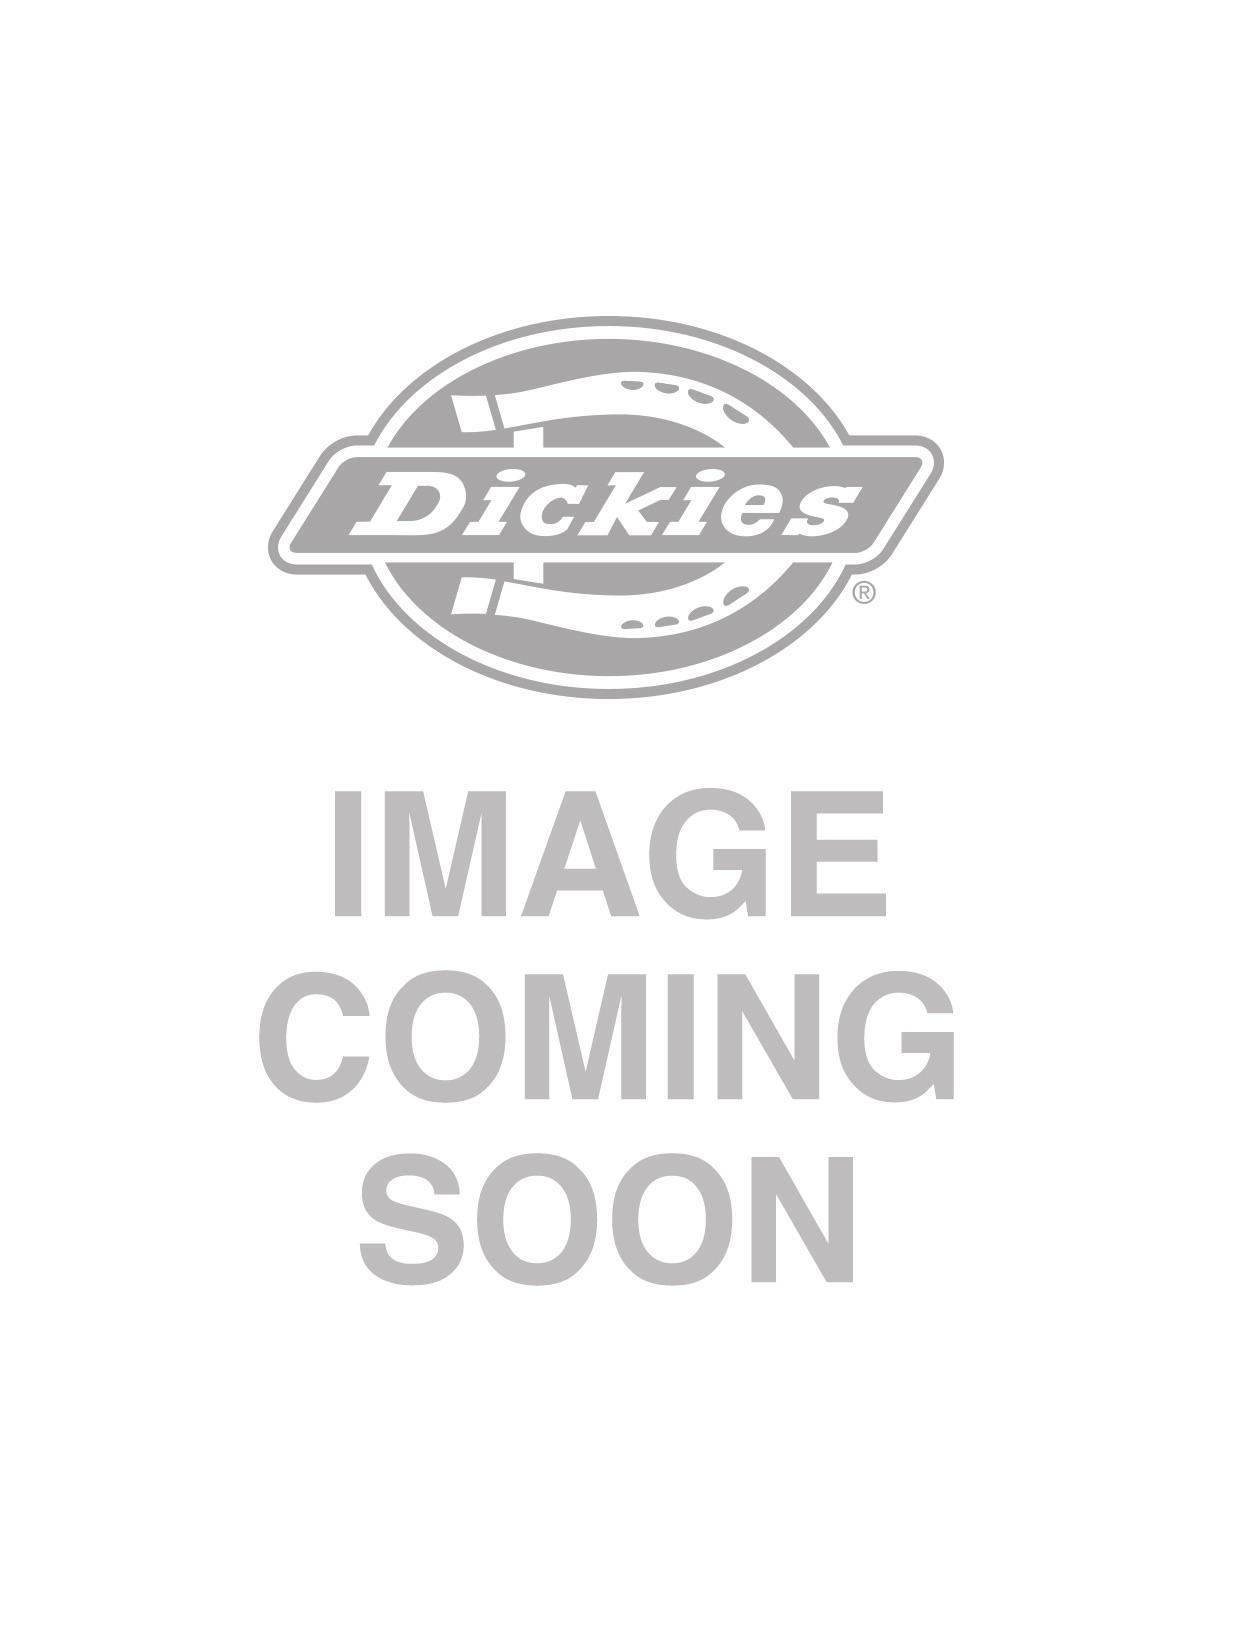 Dickies Short Sleeve Pocket T-Shirt